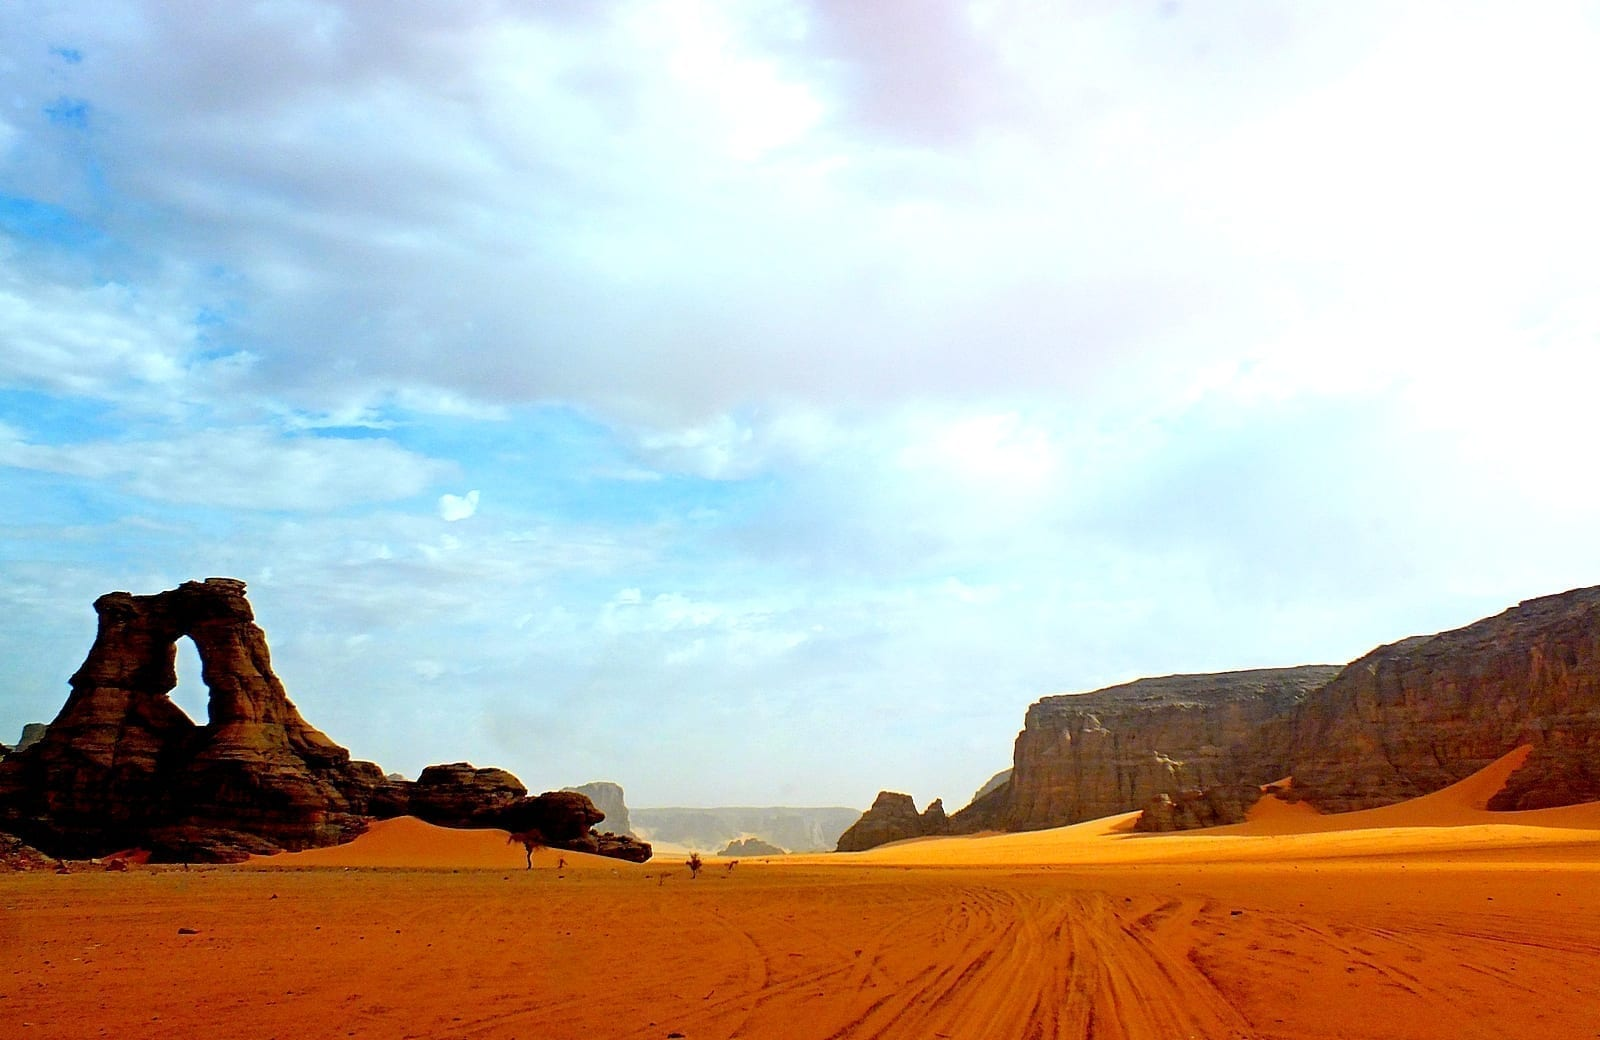 Parque cultural de Tassili Argelia